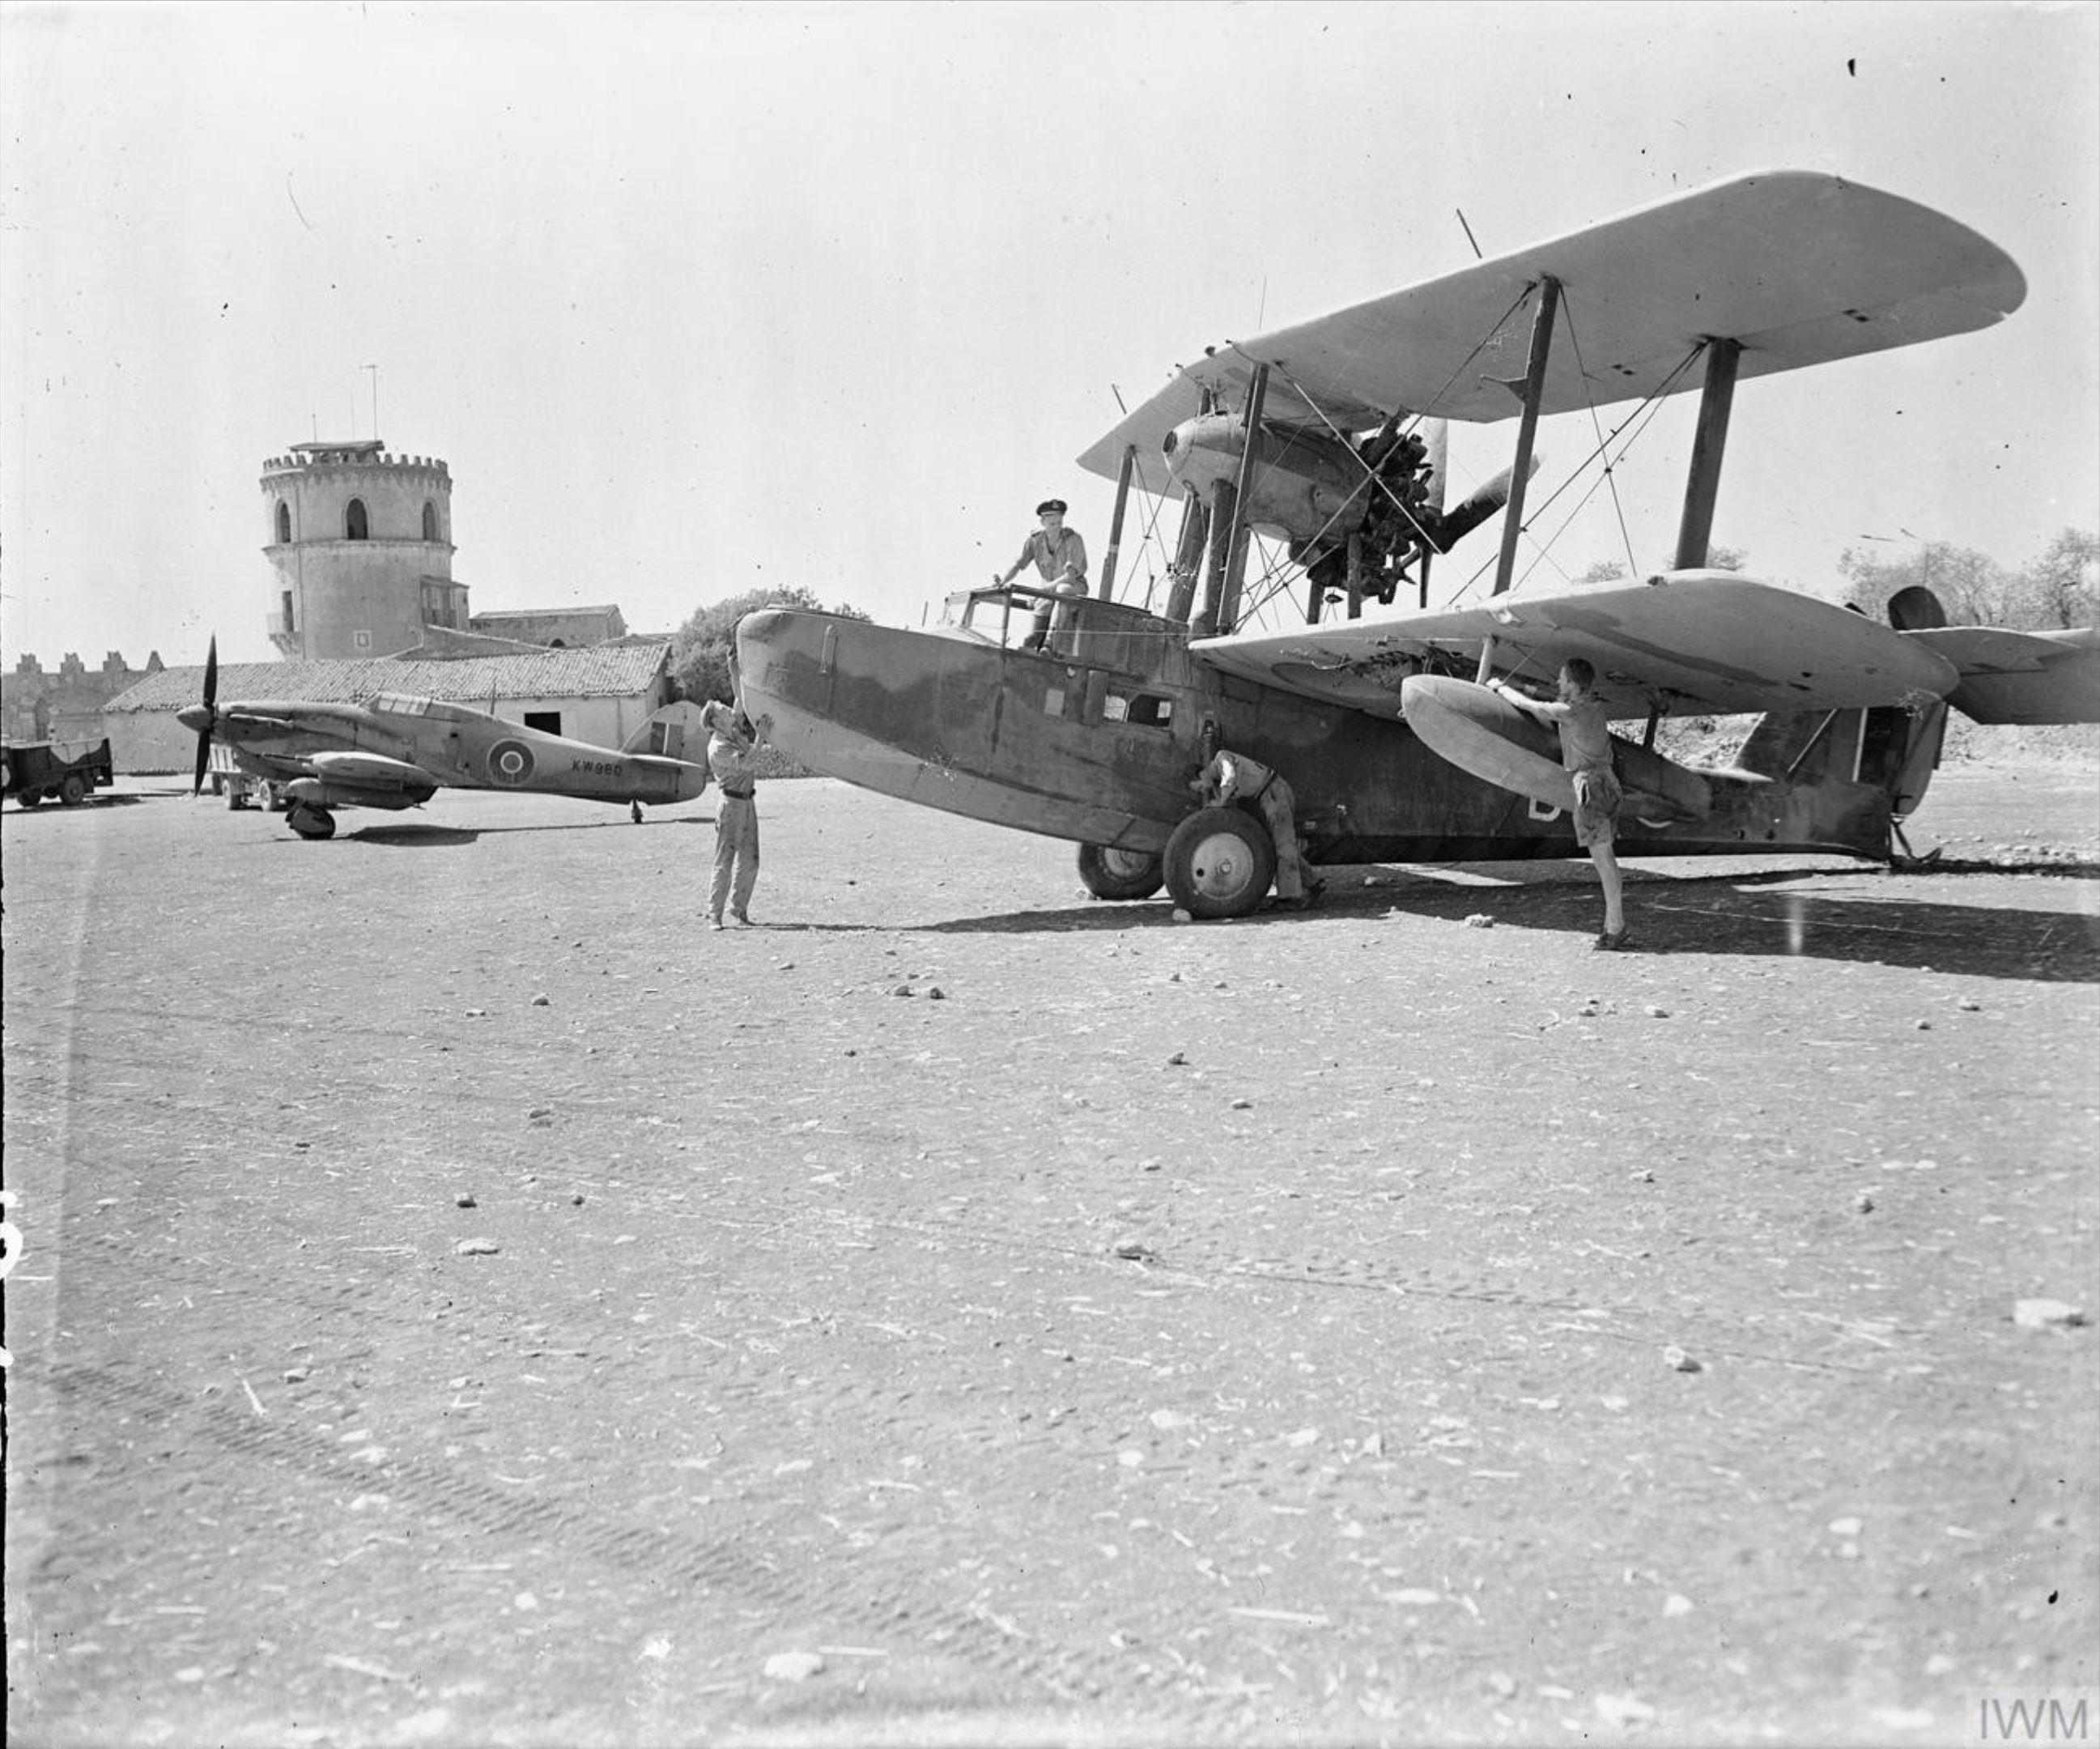 Hurricane IIC RAF KW980 at Cassibile Sicily IWM CNA1188